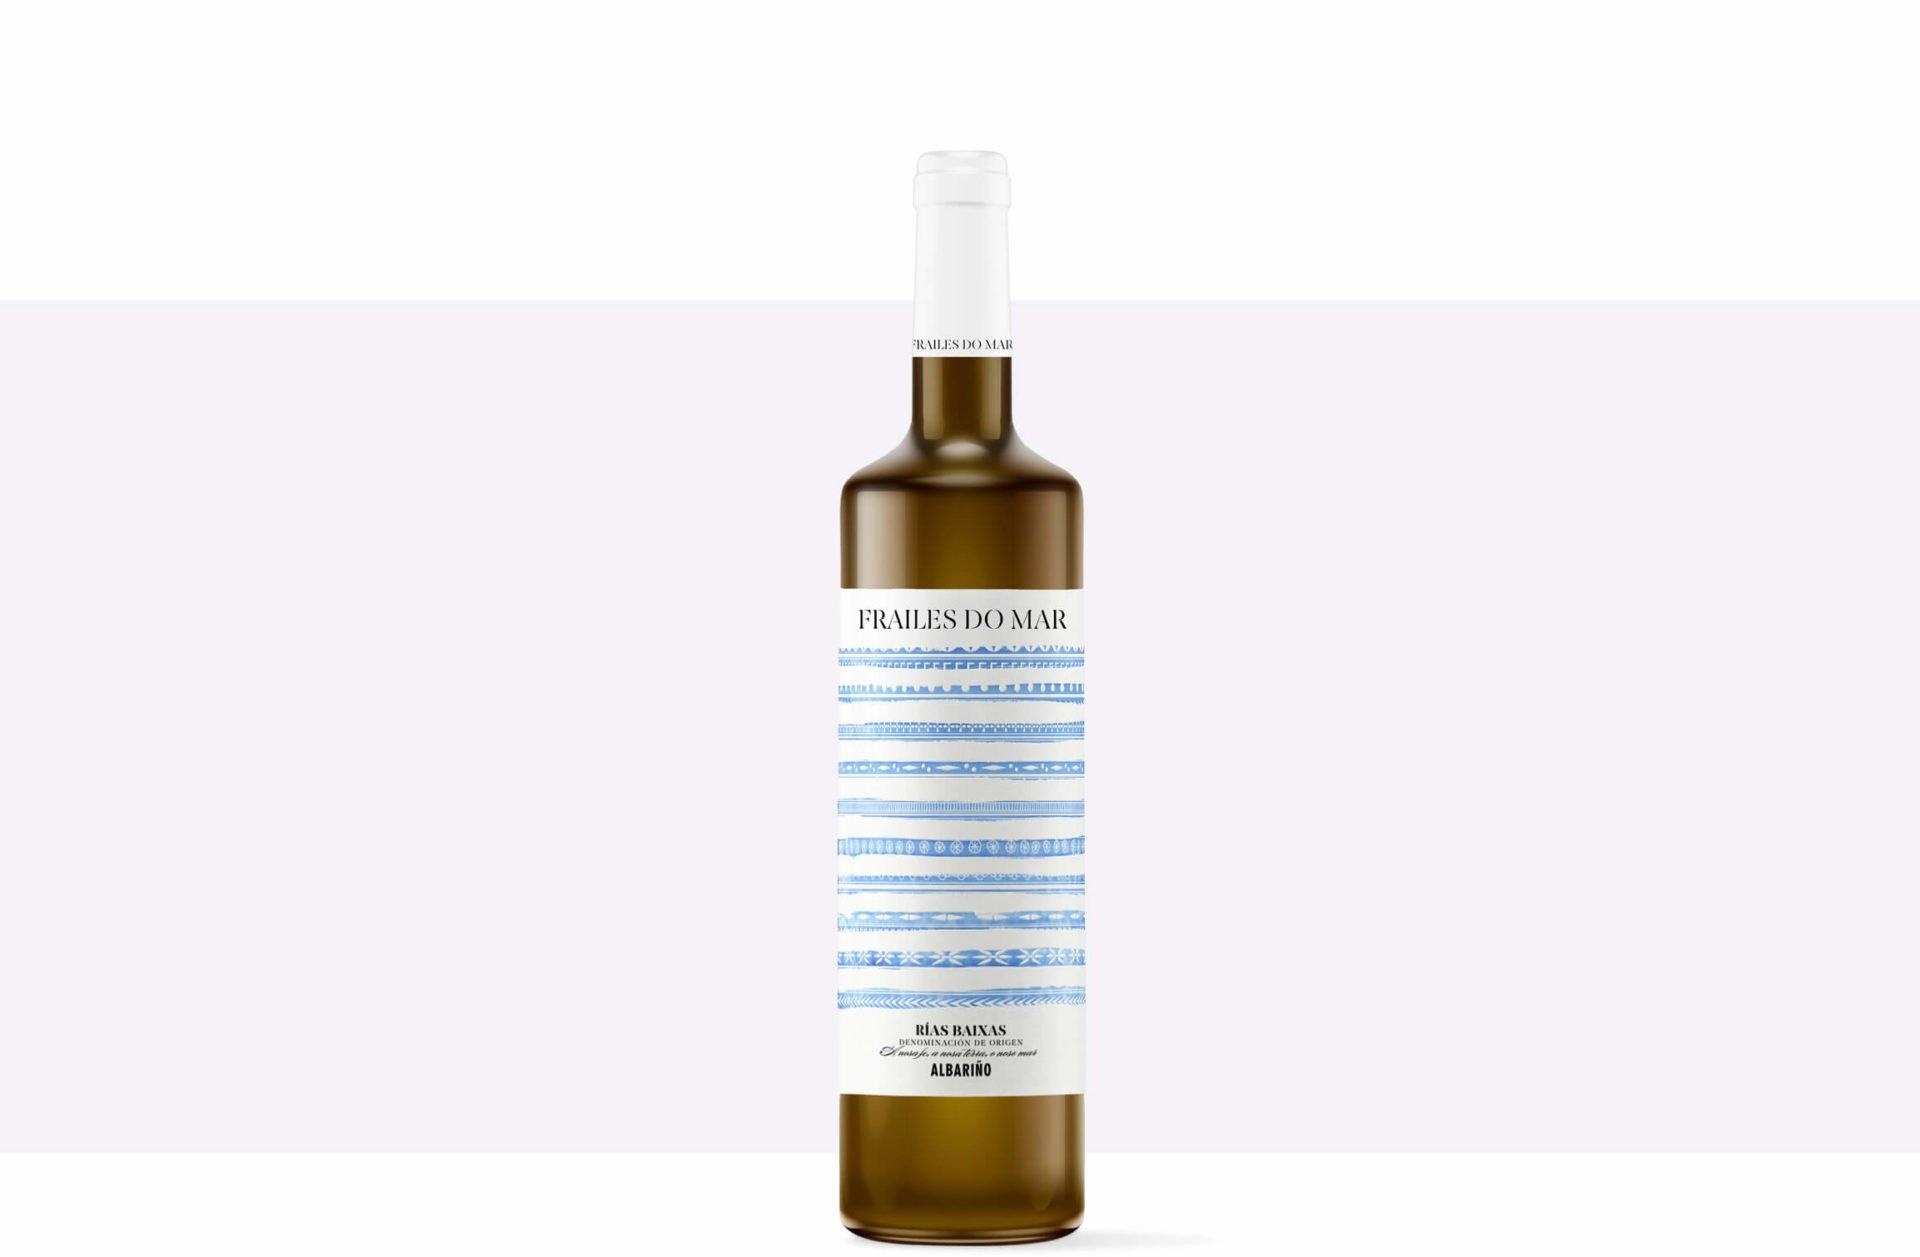 diseño-packaging-etiqueta-vino-frailes-do-mar-albariño-vino-galicia